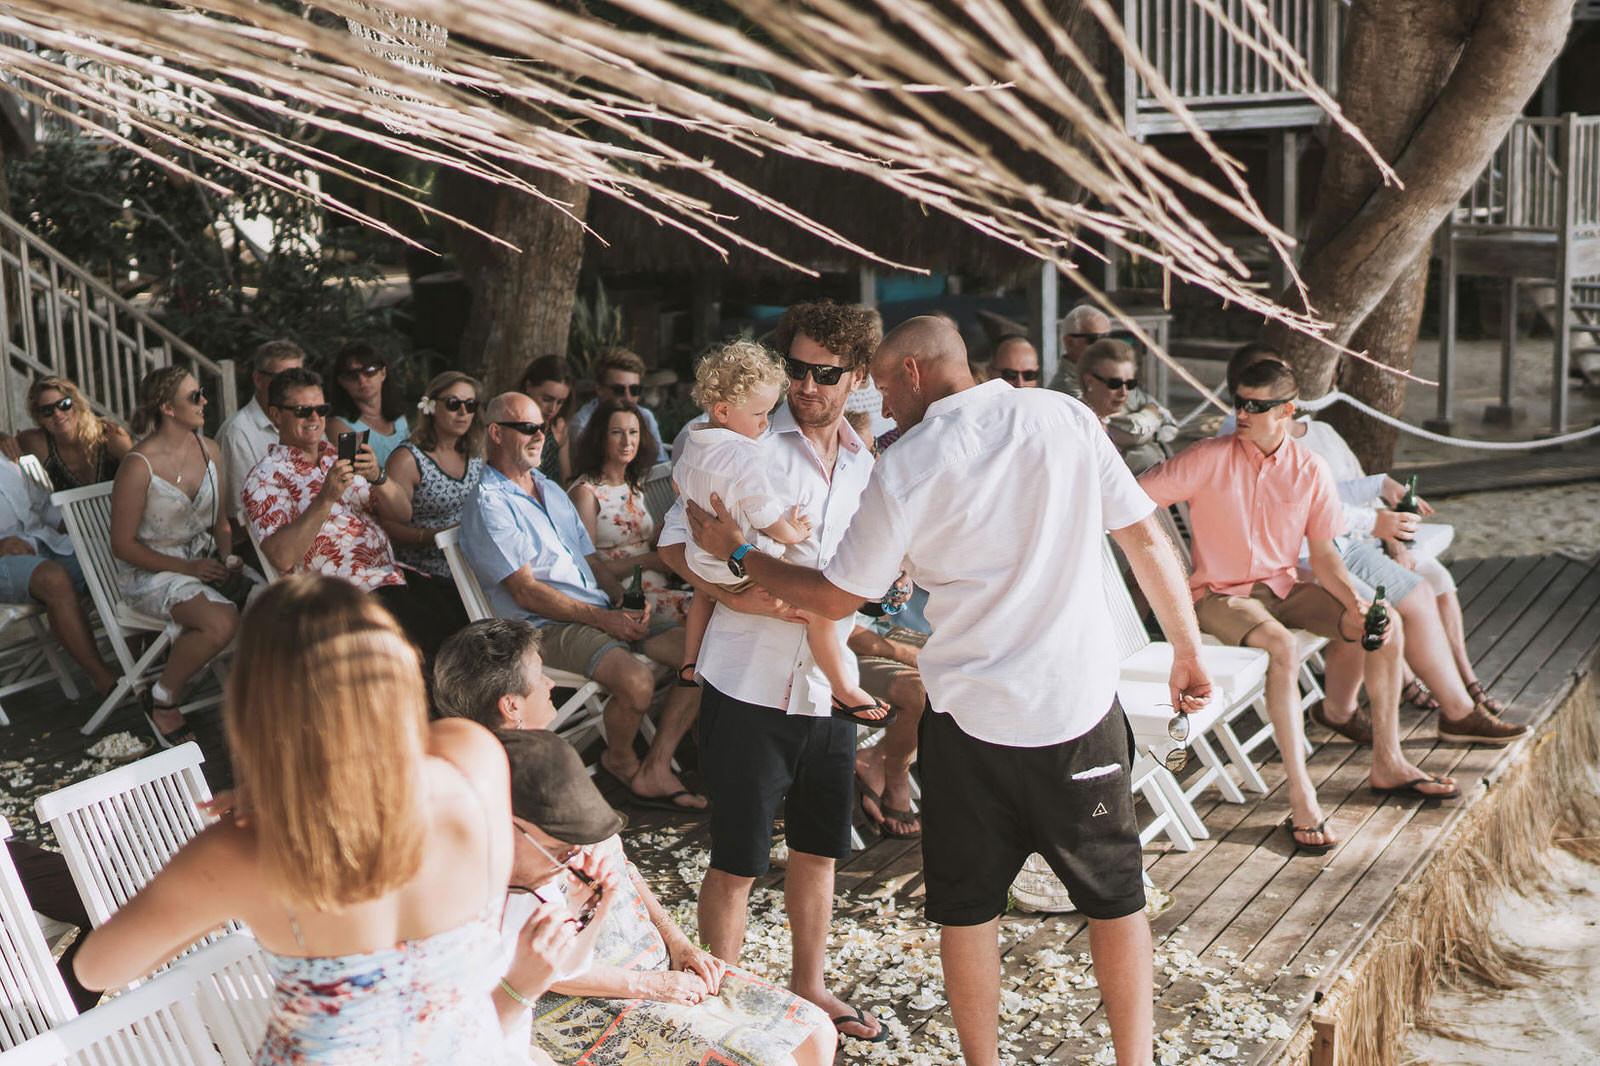 newfound-hai-tide-nusa-lembongan-bali-wedding-photographers-106